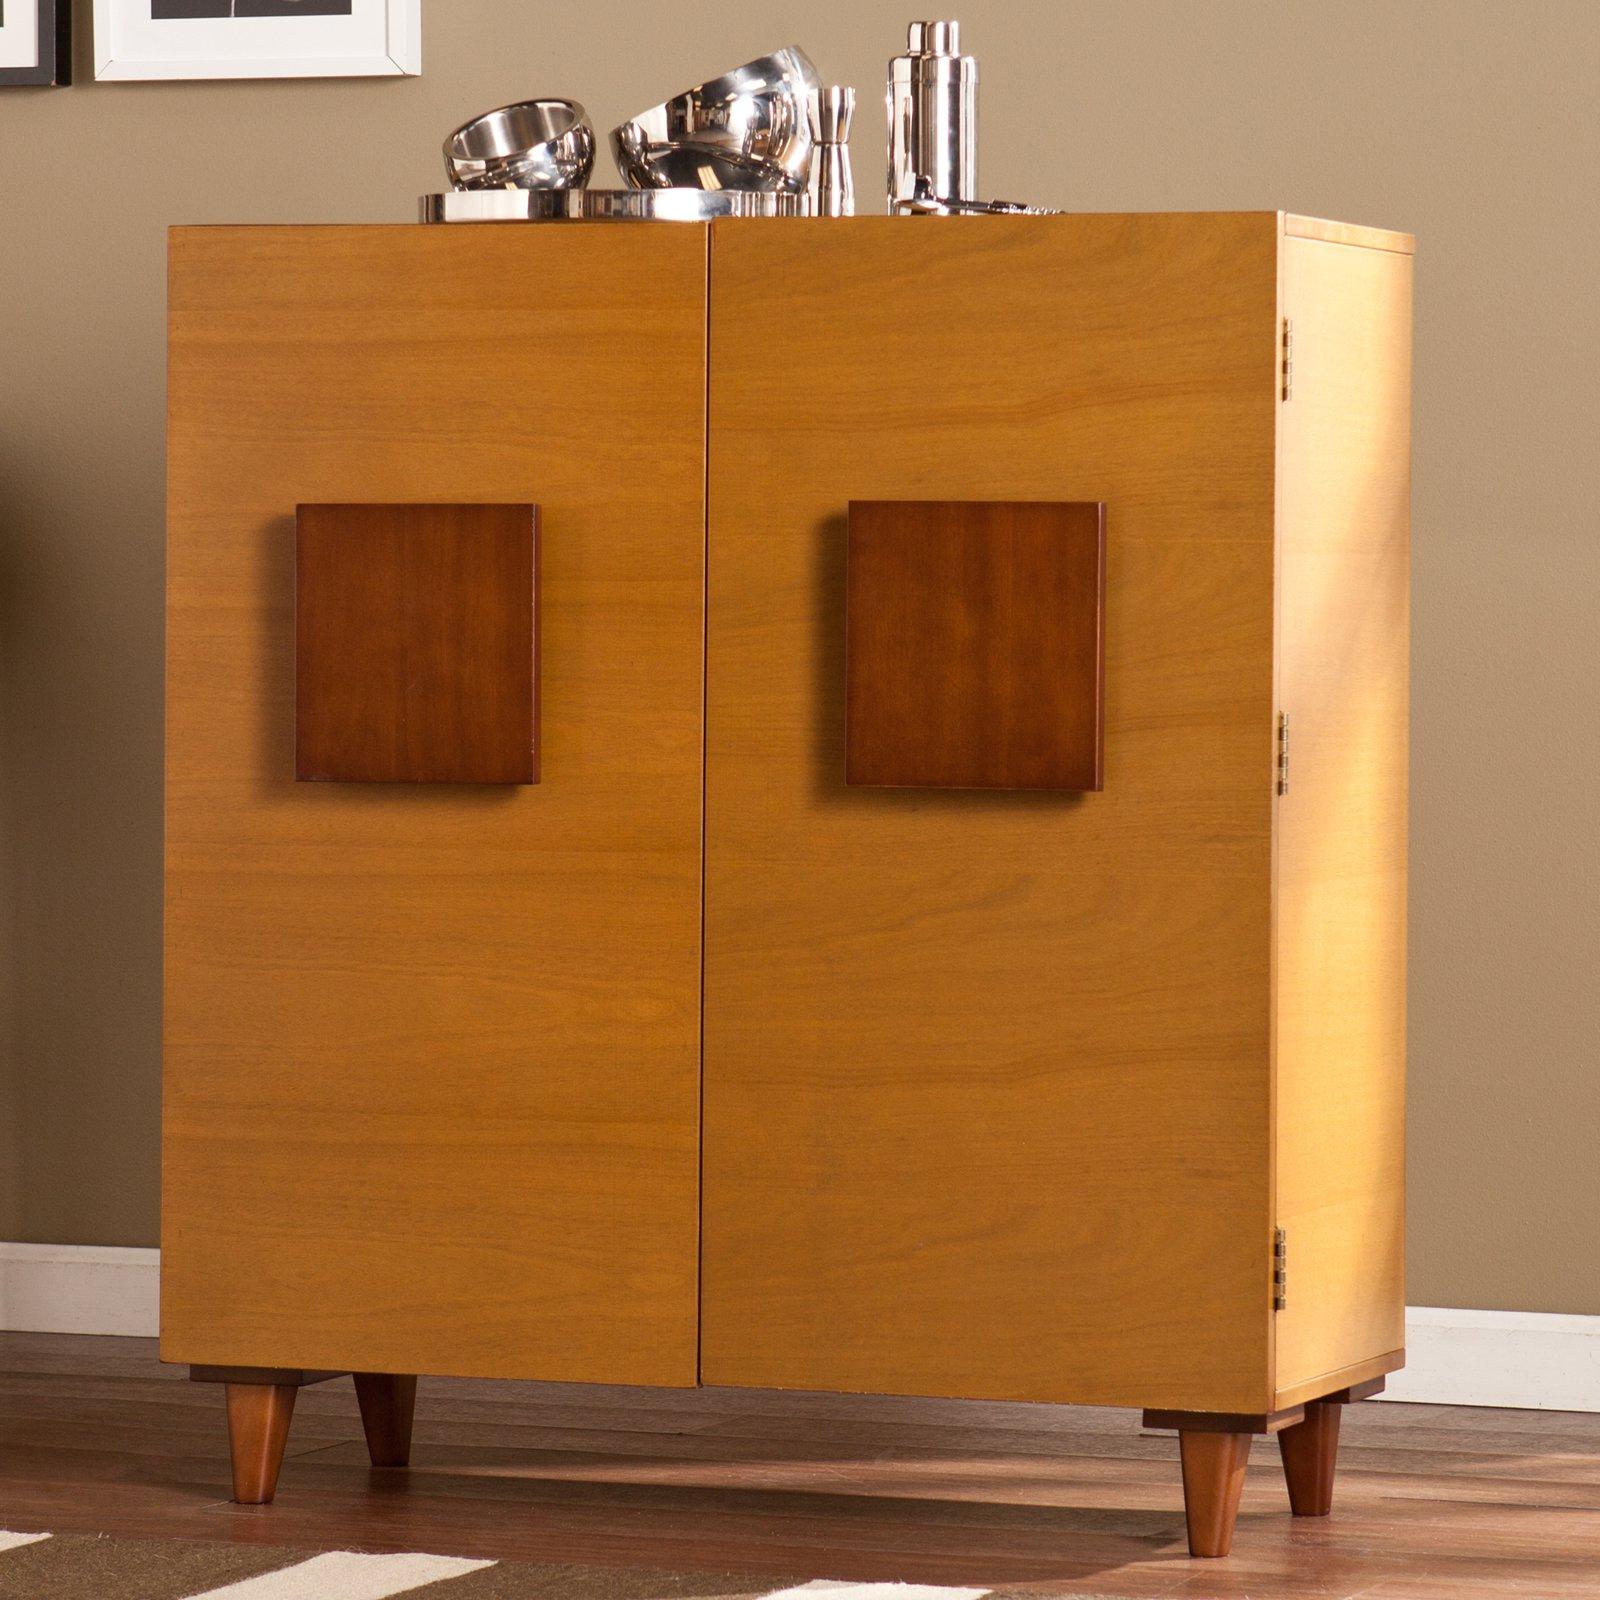 Southern Enterprises Boyle Bar/Anywhere Cabinet